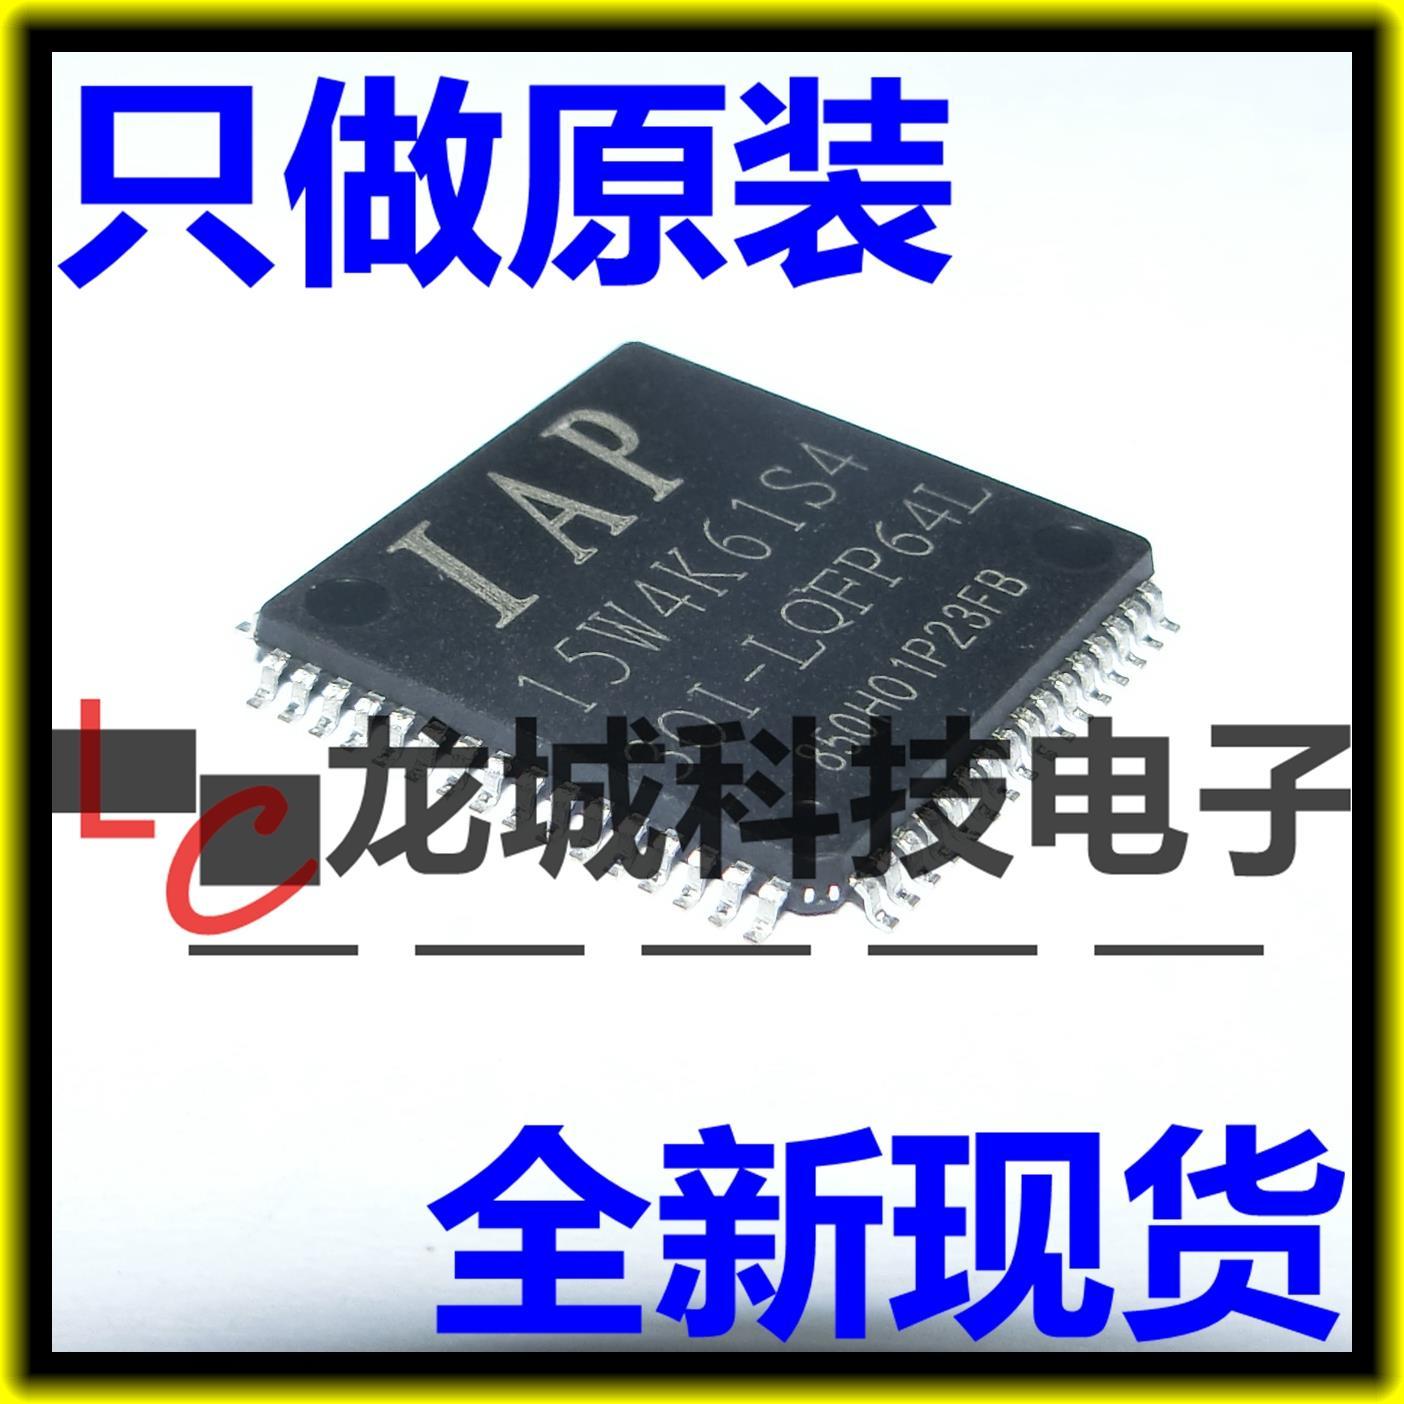 IAP15W4K61S4-30I-LQFP64L  IAP15W4K61S4 64